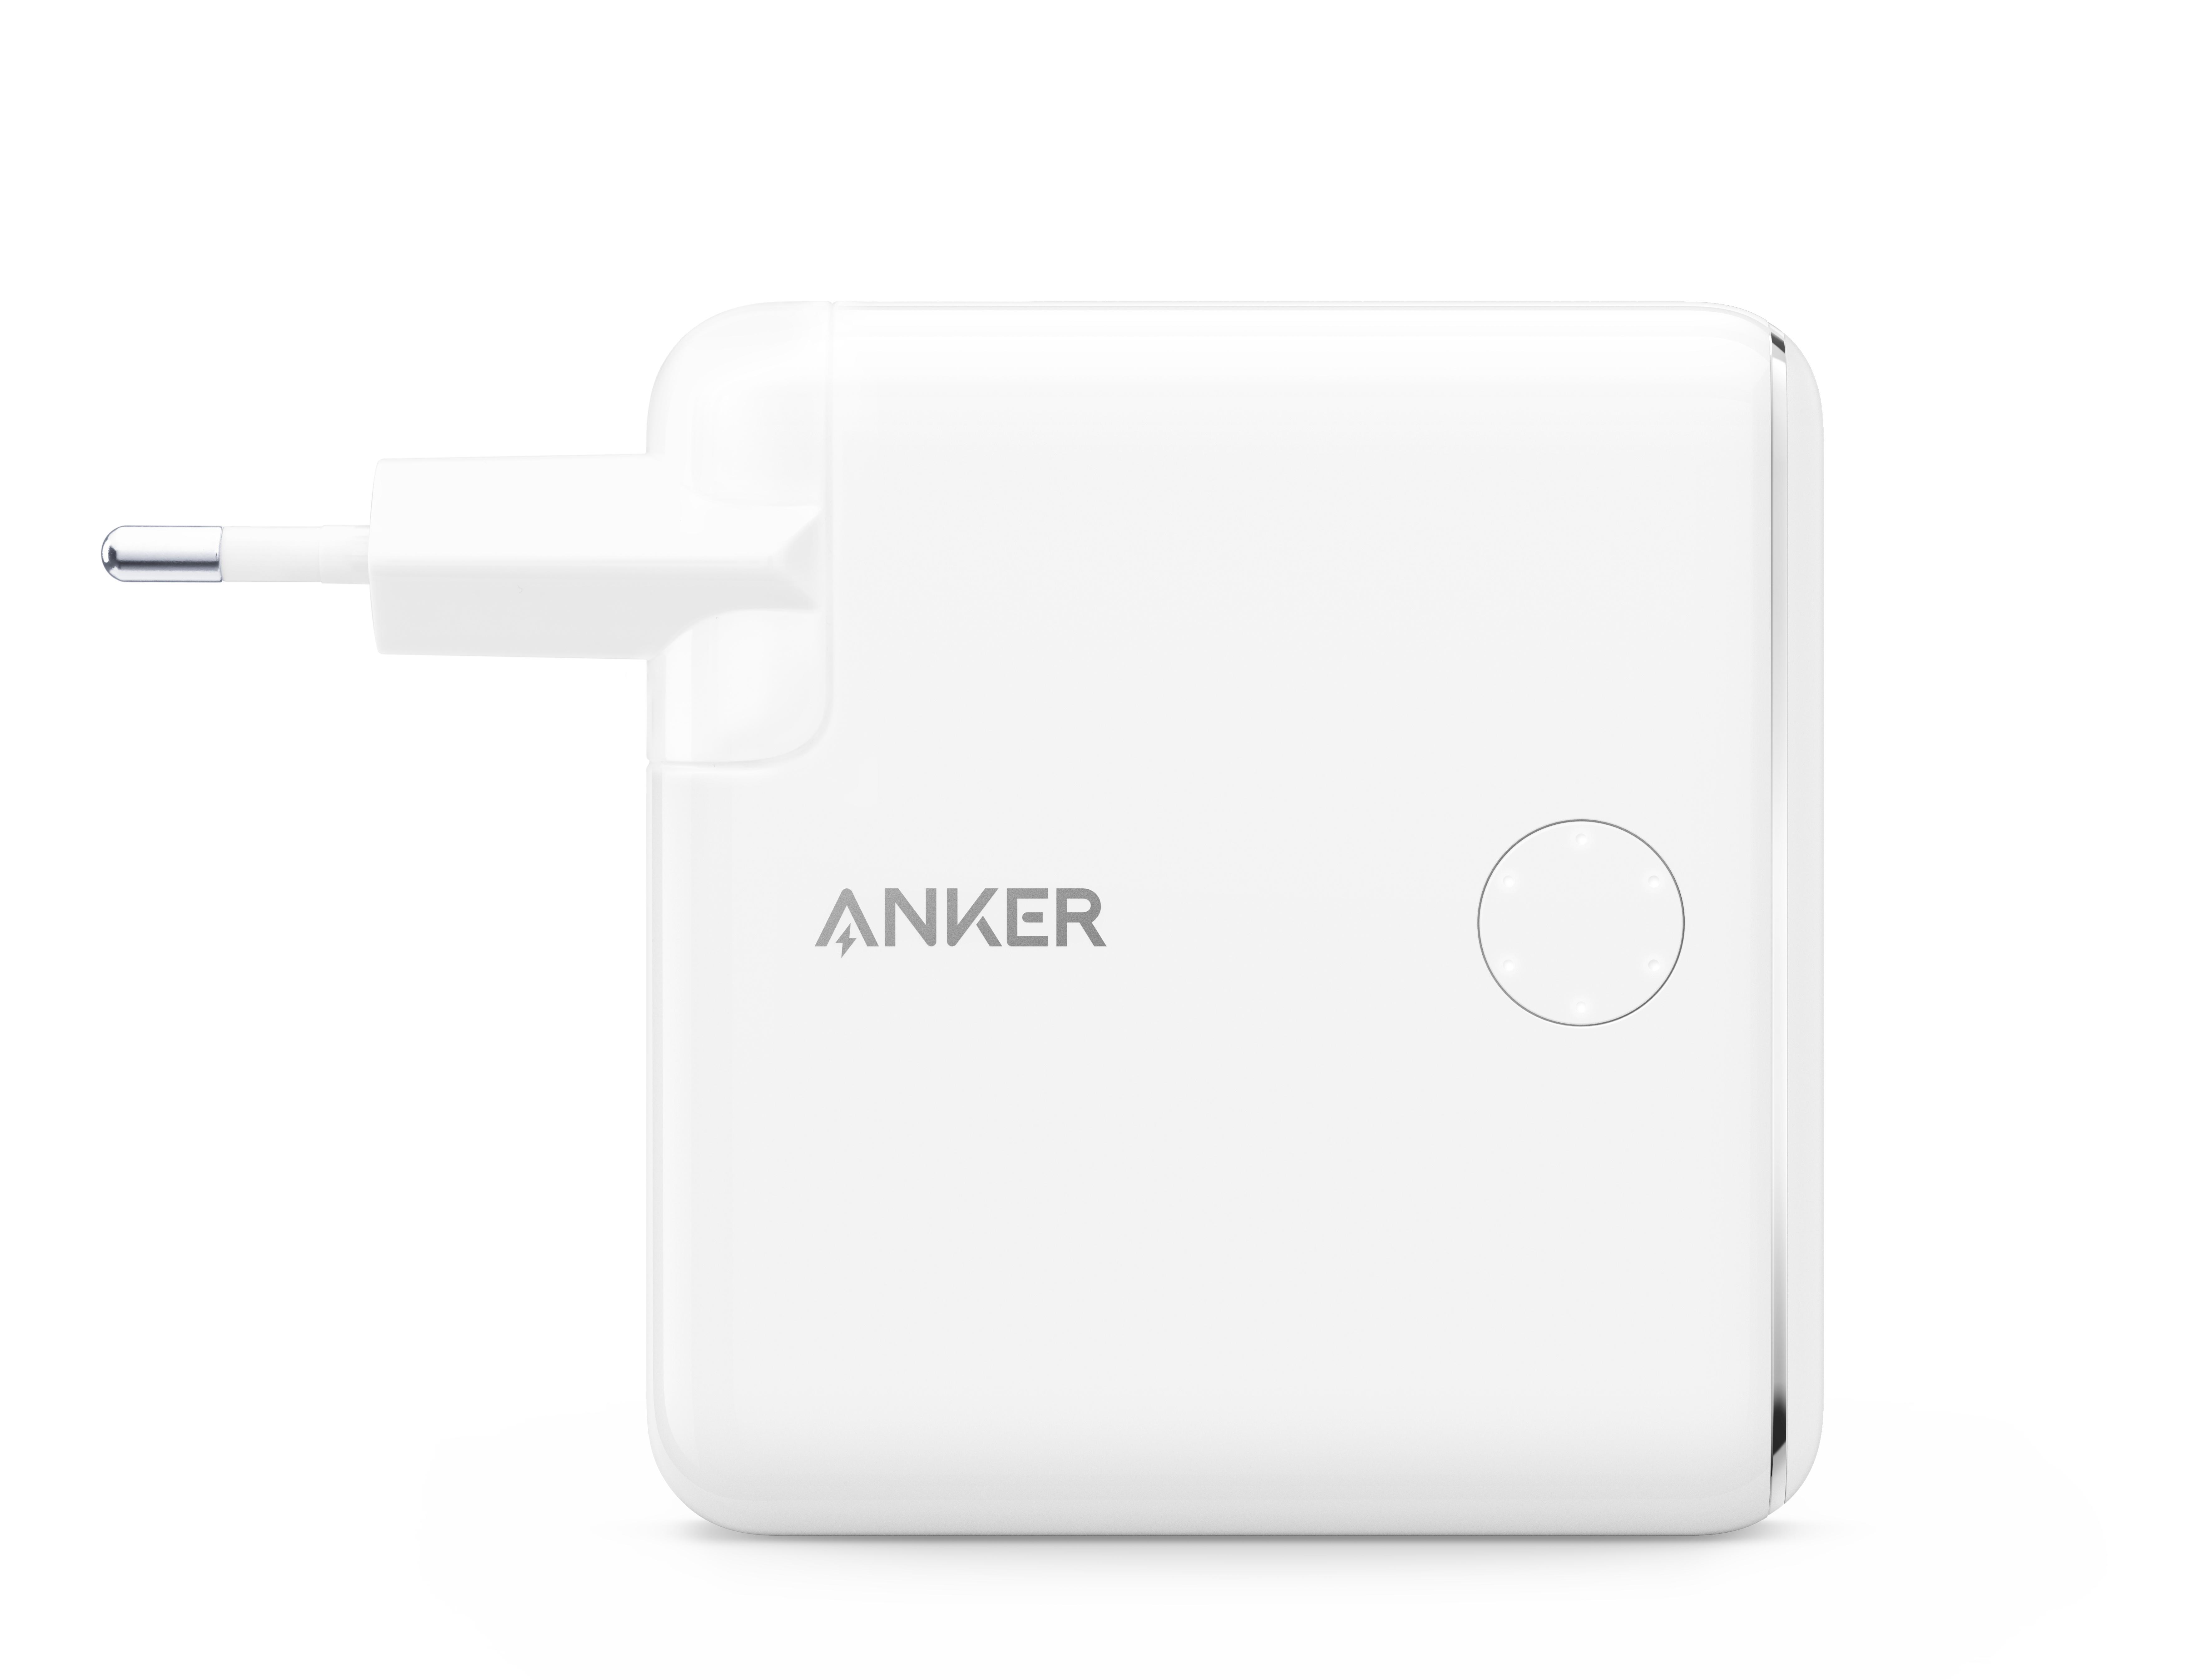 Anker PowerCore Fusion Power Delivery Batterie und Ladegerät